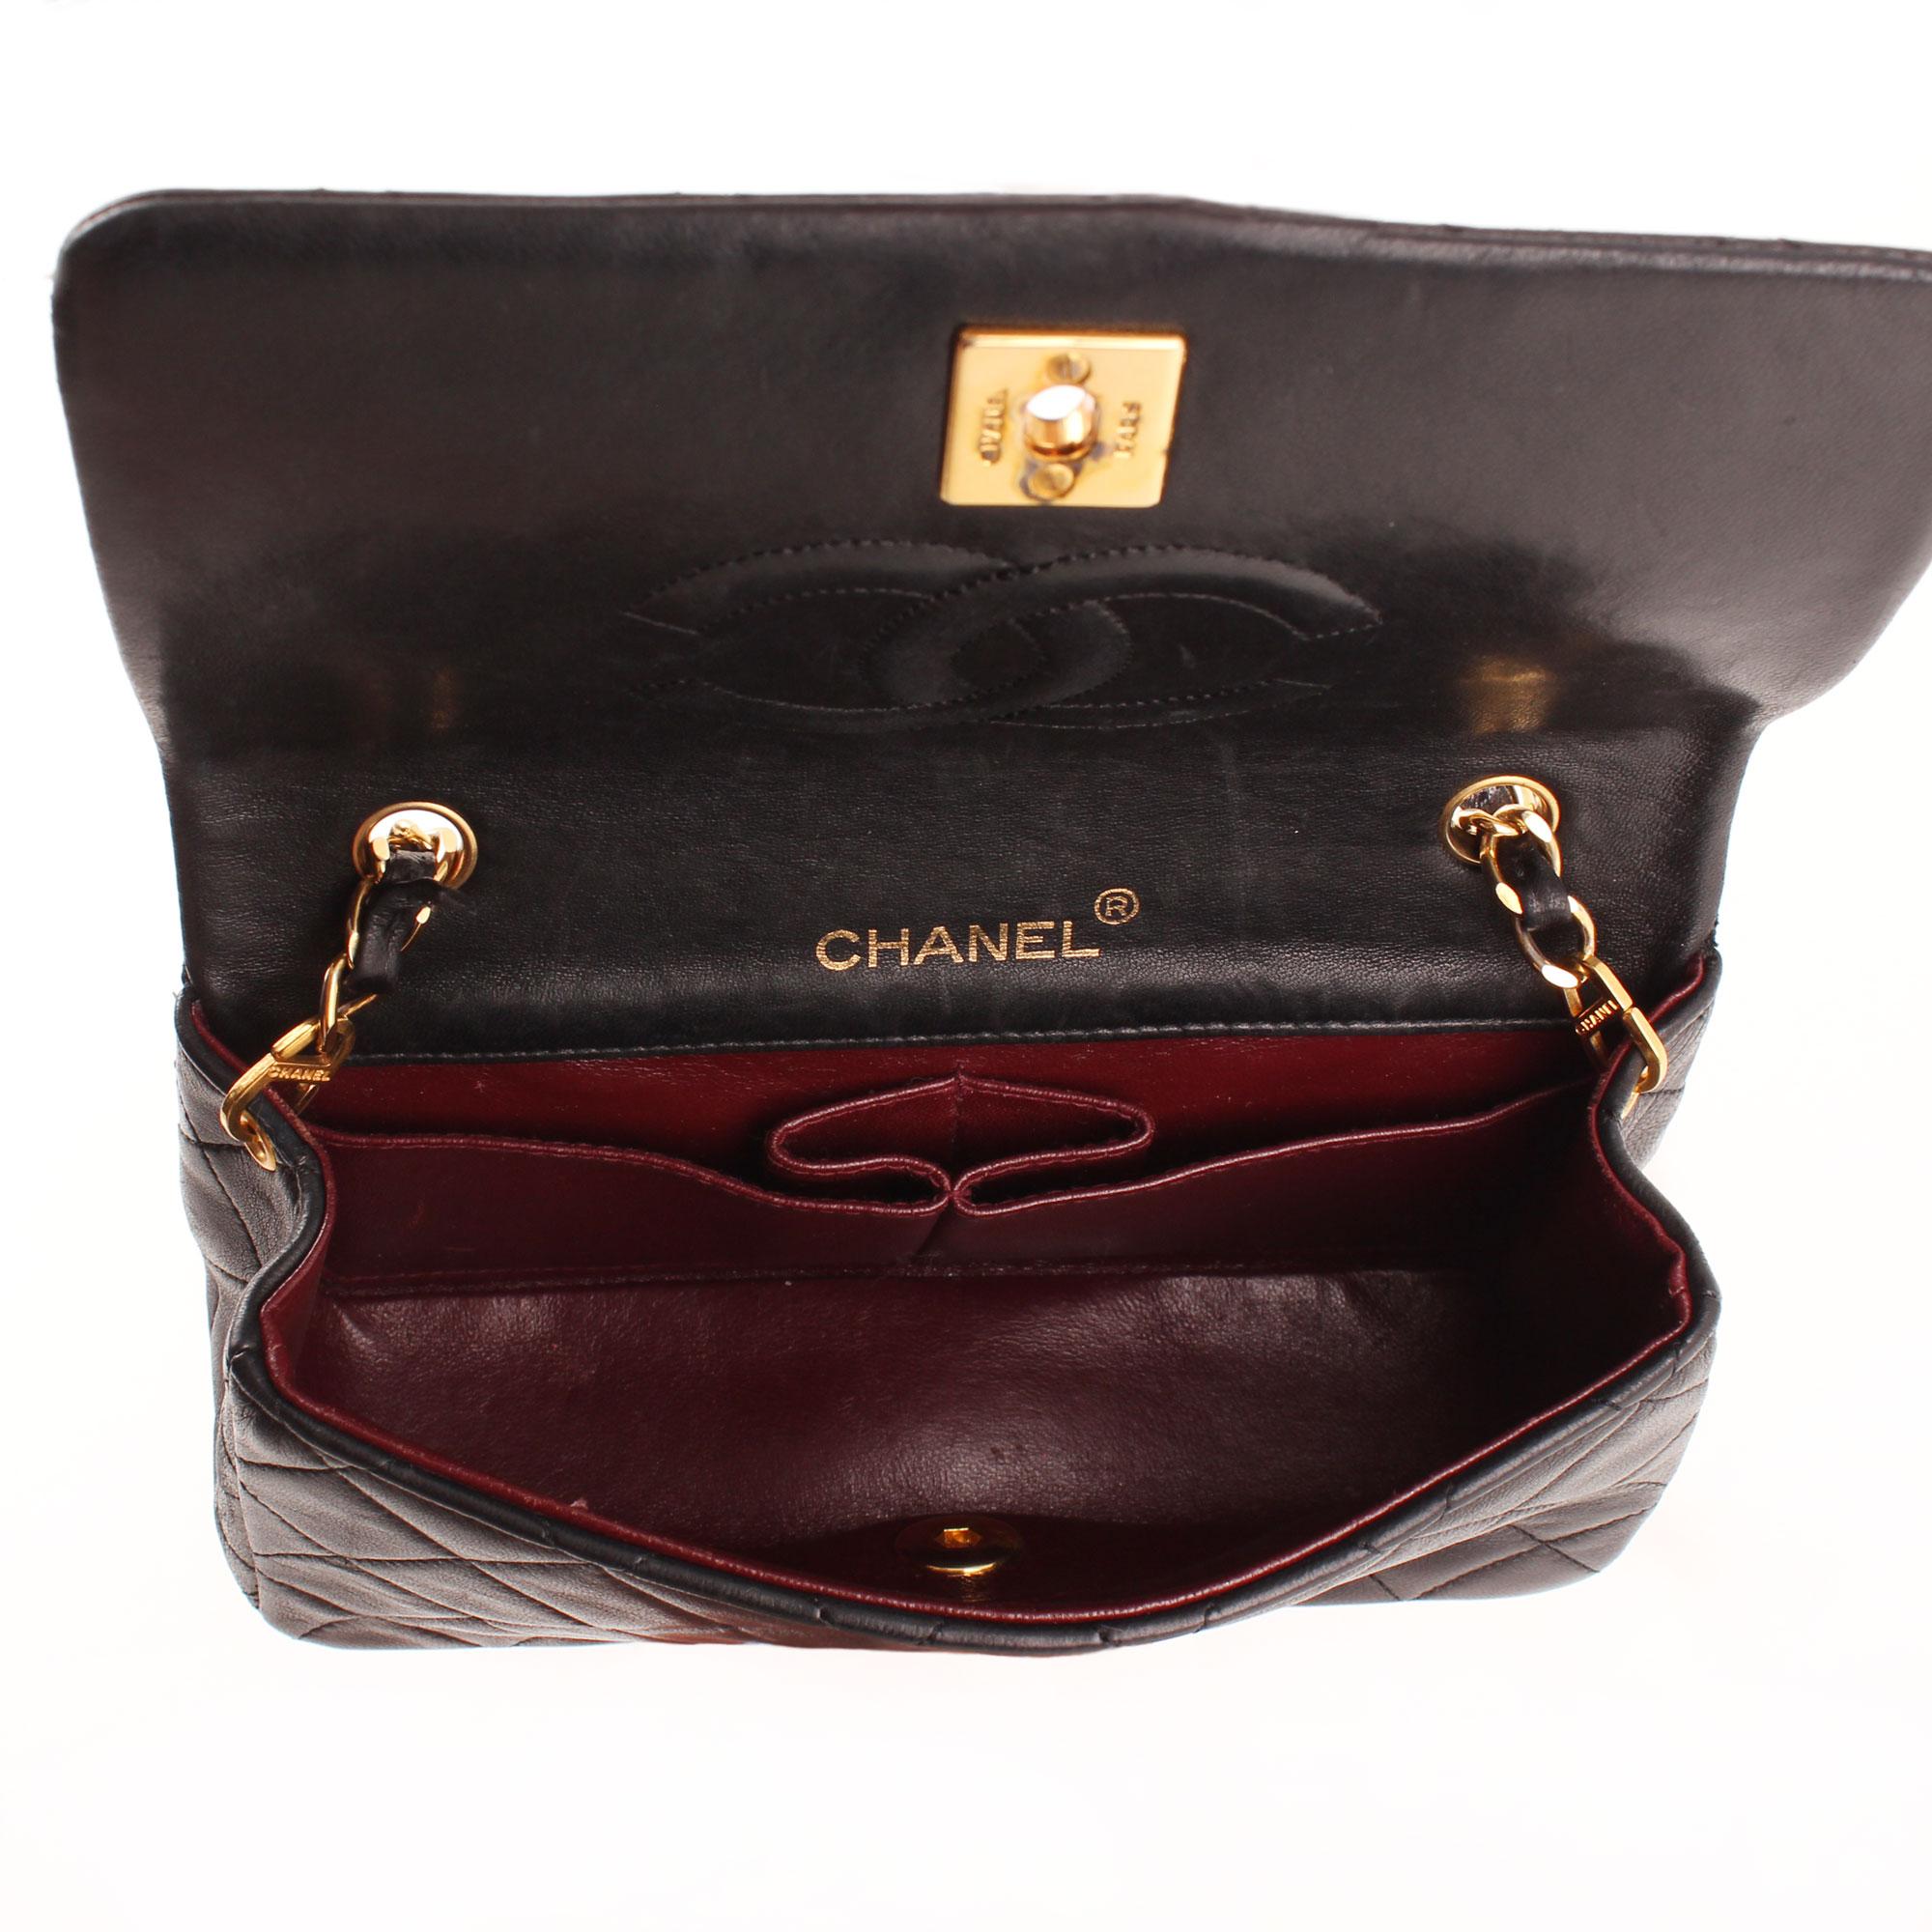 Chanel Vintage Timeless Flap Bag I Cbl Bags